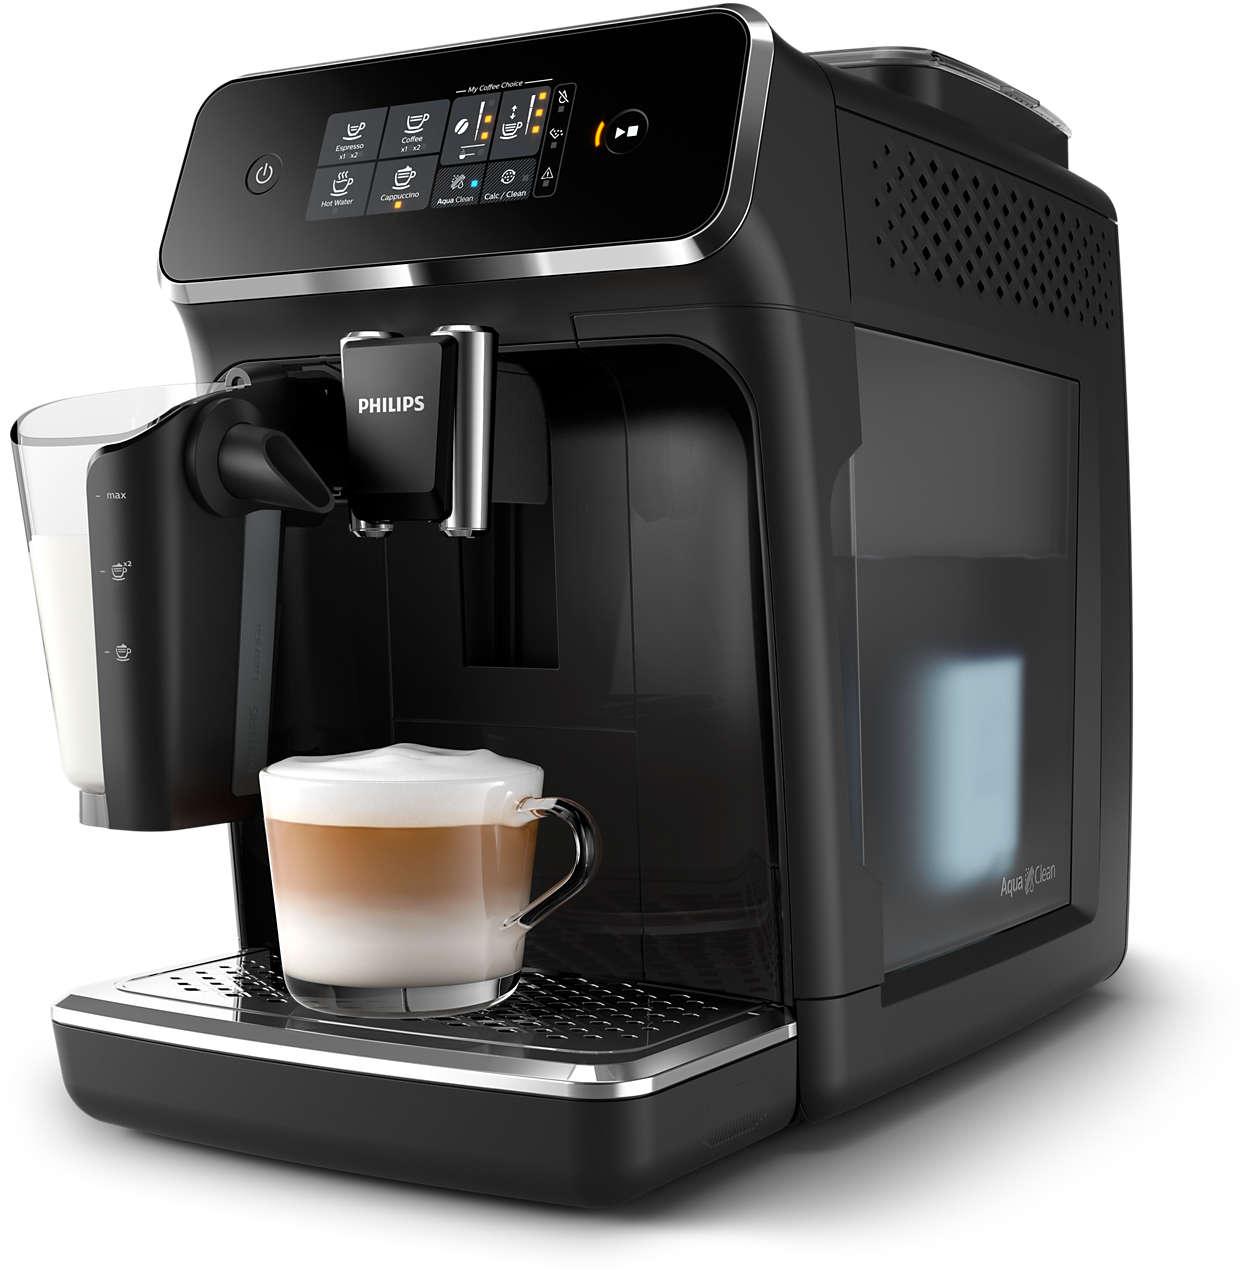 3 deliziose varietà di caffè da chicchi freschi, senza sforzi